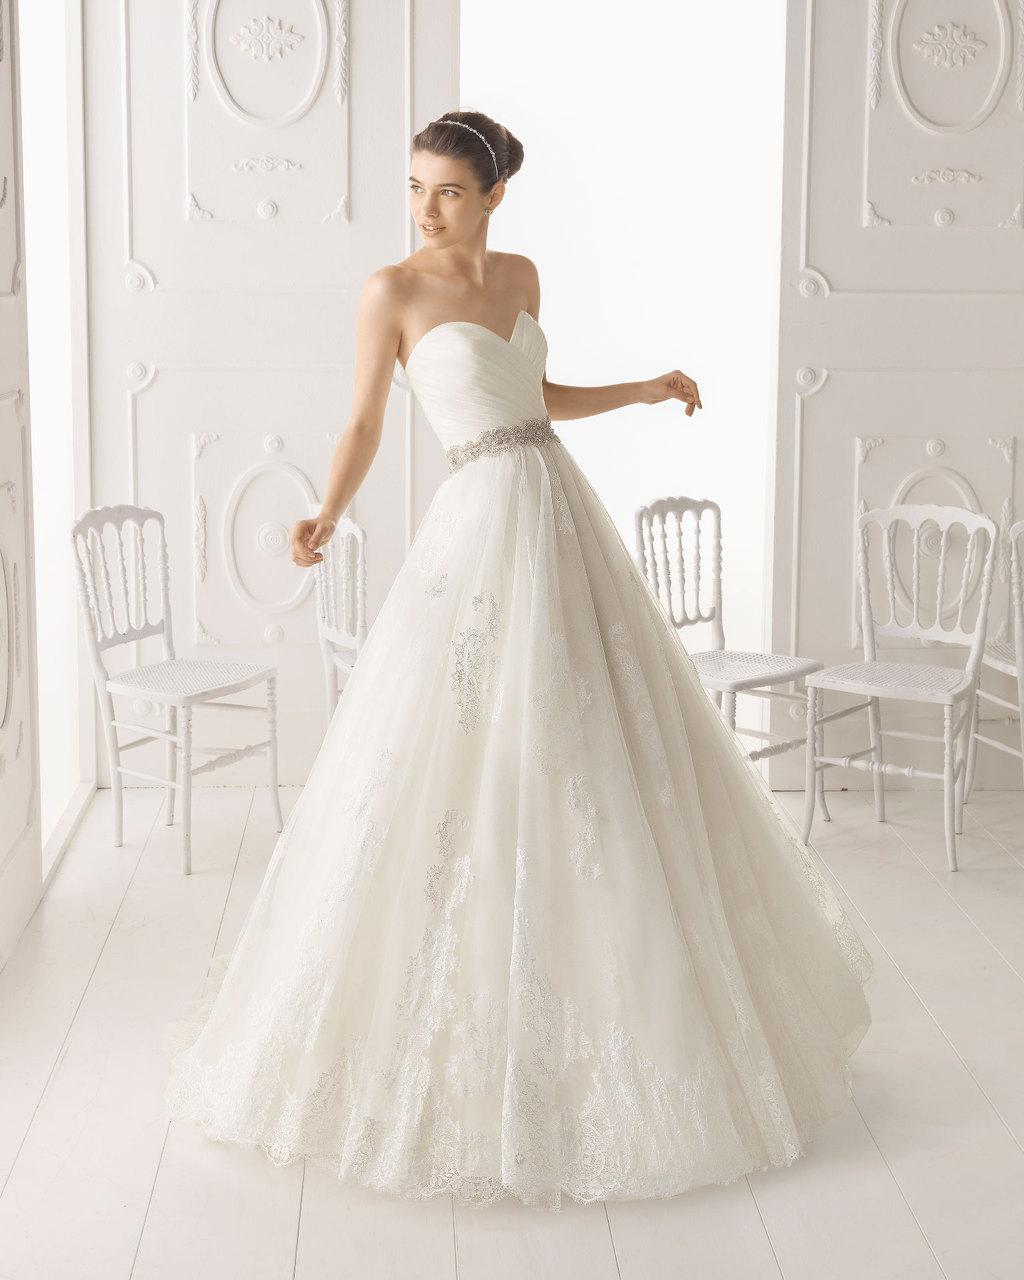 Aire-barcelona-wedding-dress-2014-bridal-omega.full